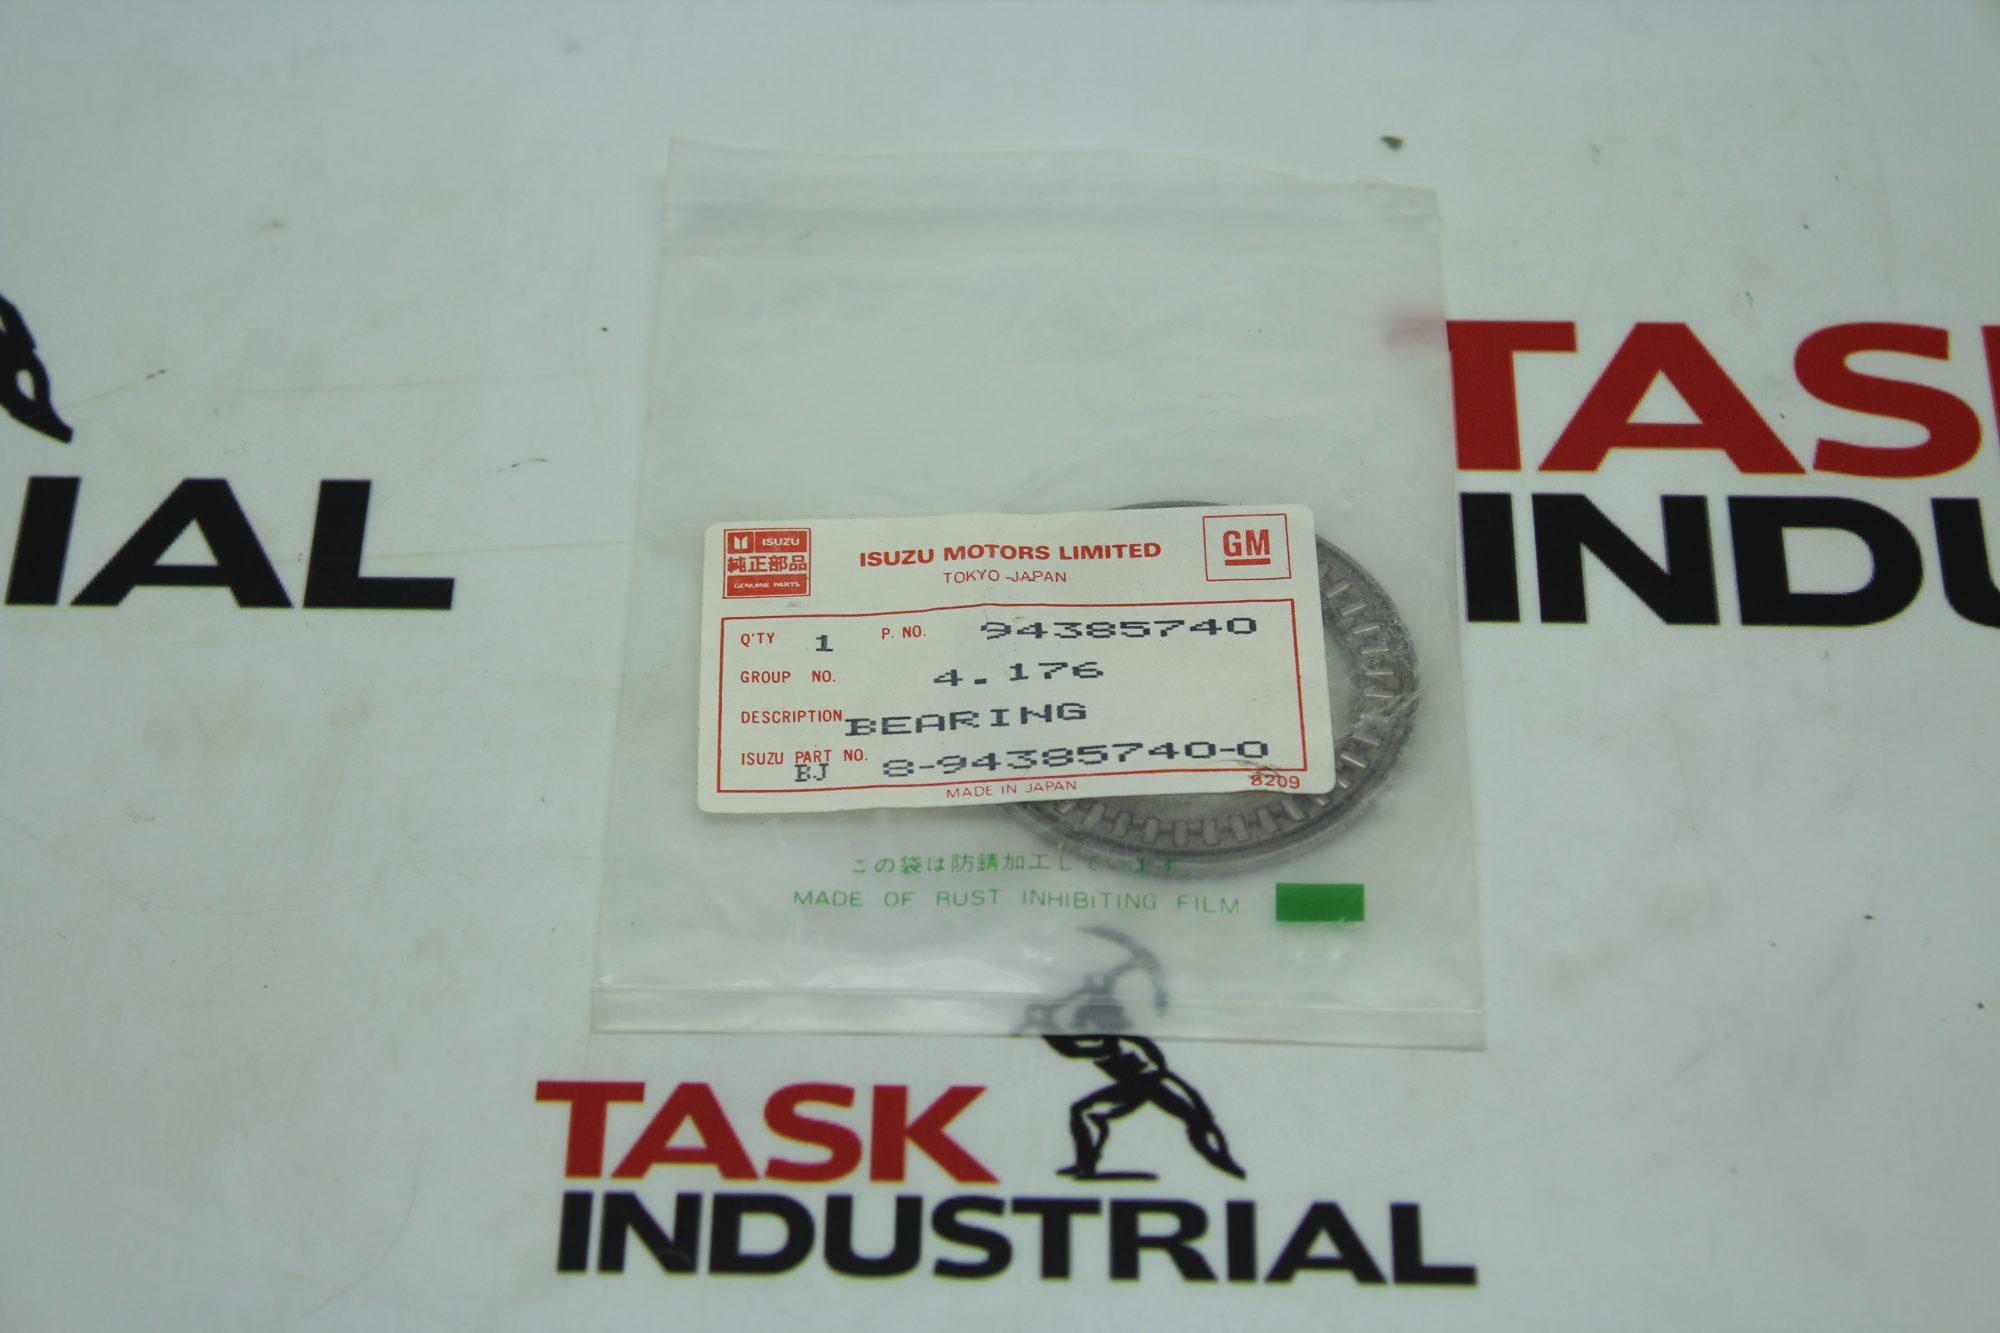 Isuzu Motors 94385740 Bearing BJ 8-94385740-0